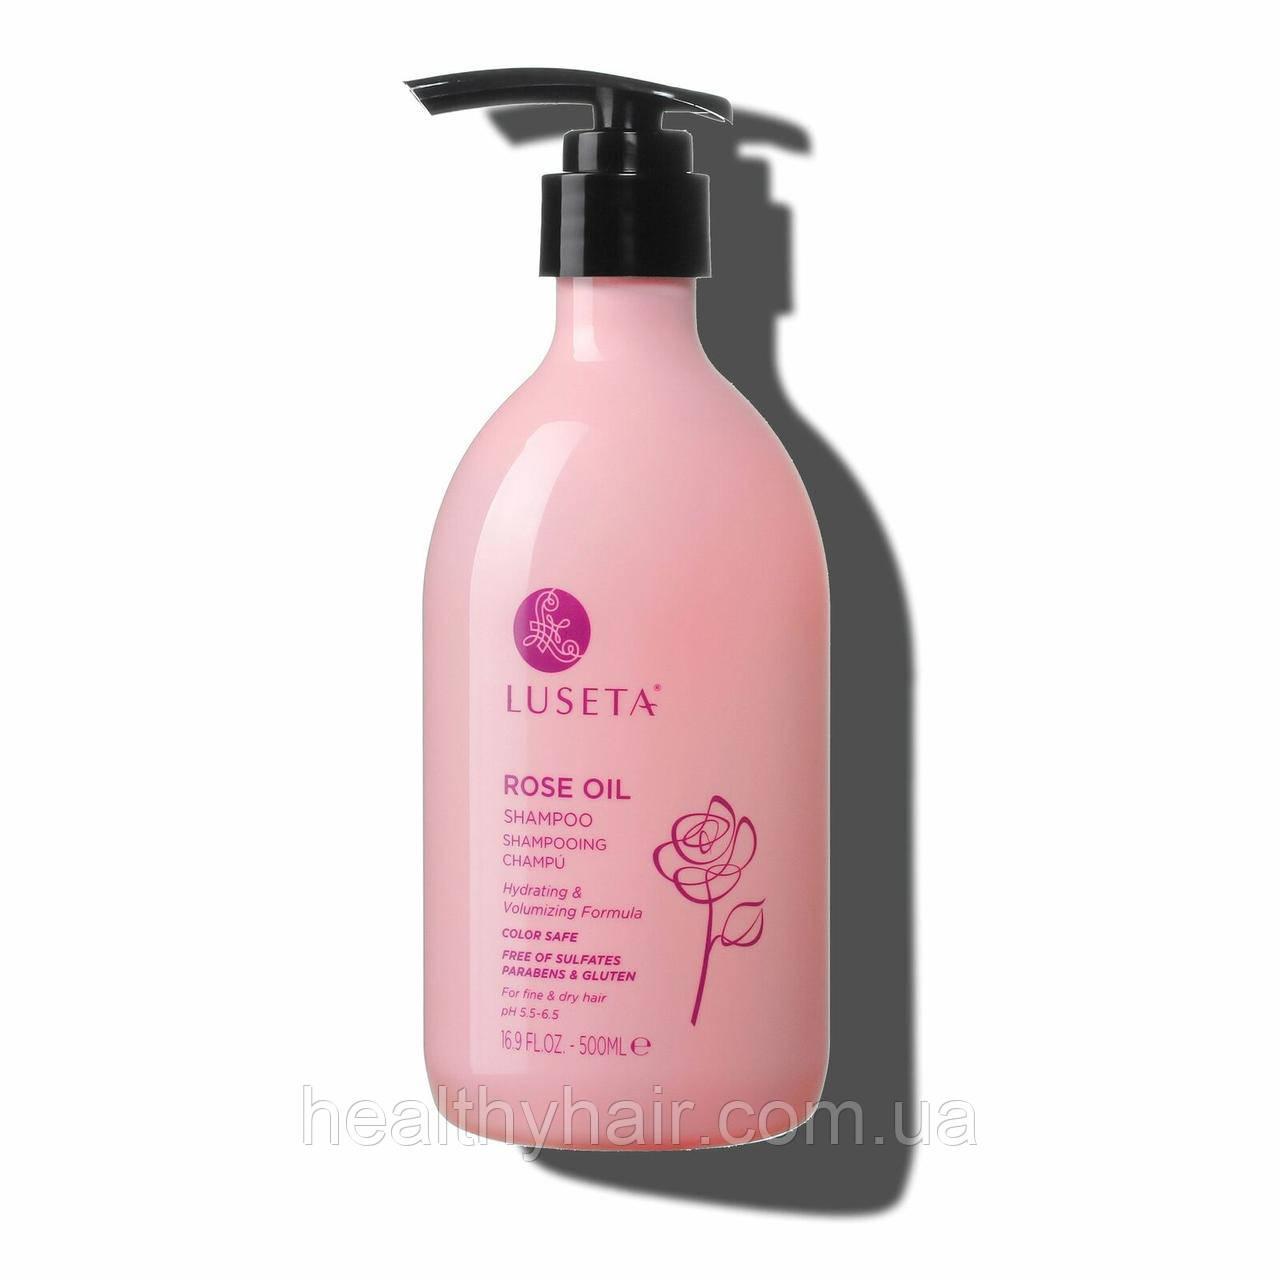 Шампунь для обьема волос Luseta Rose Oil Shampoo 500ml